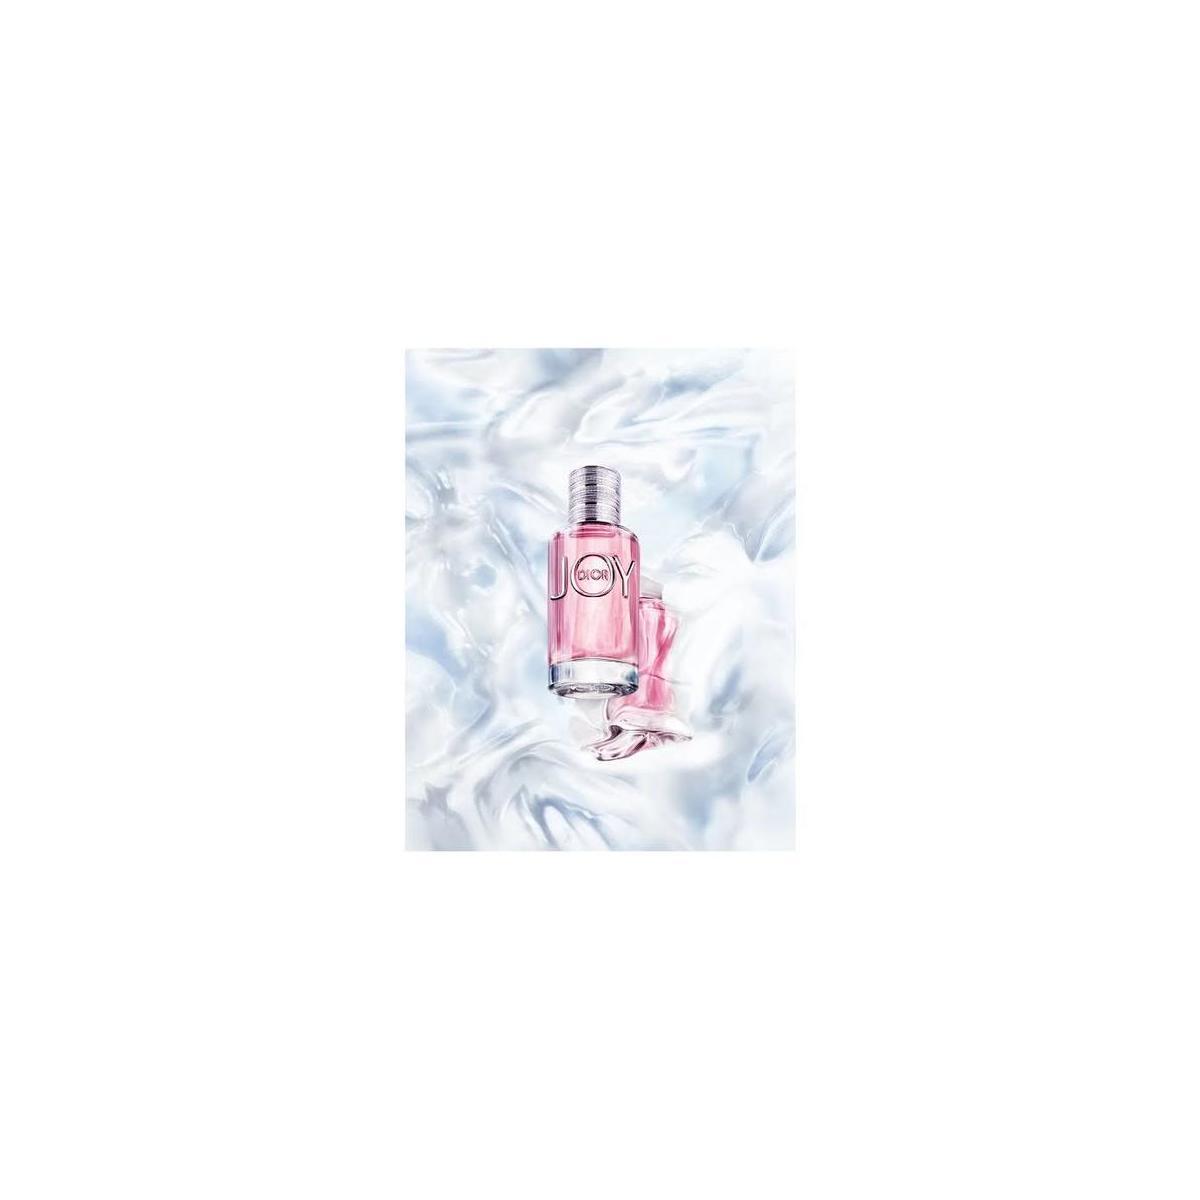 Christian Dior Joy For Women Eau De Parfum Spray 3.0 Ounce